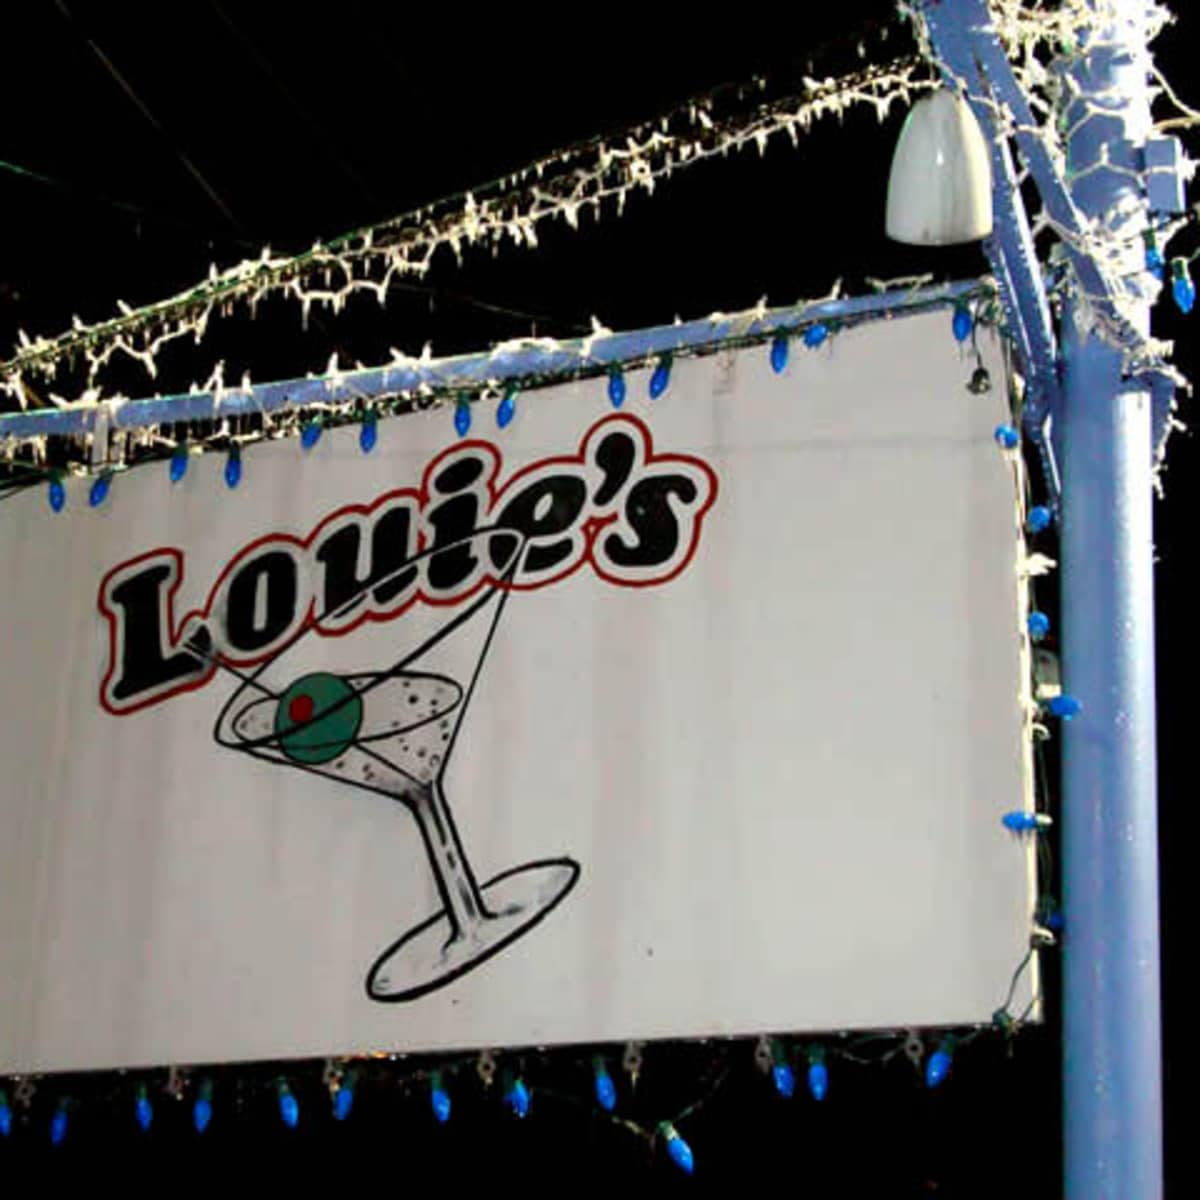 Sign of Louie's restaurant in Dallas